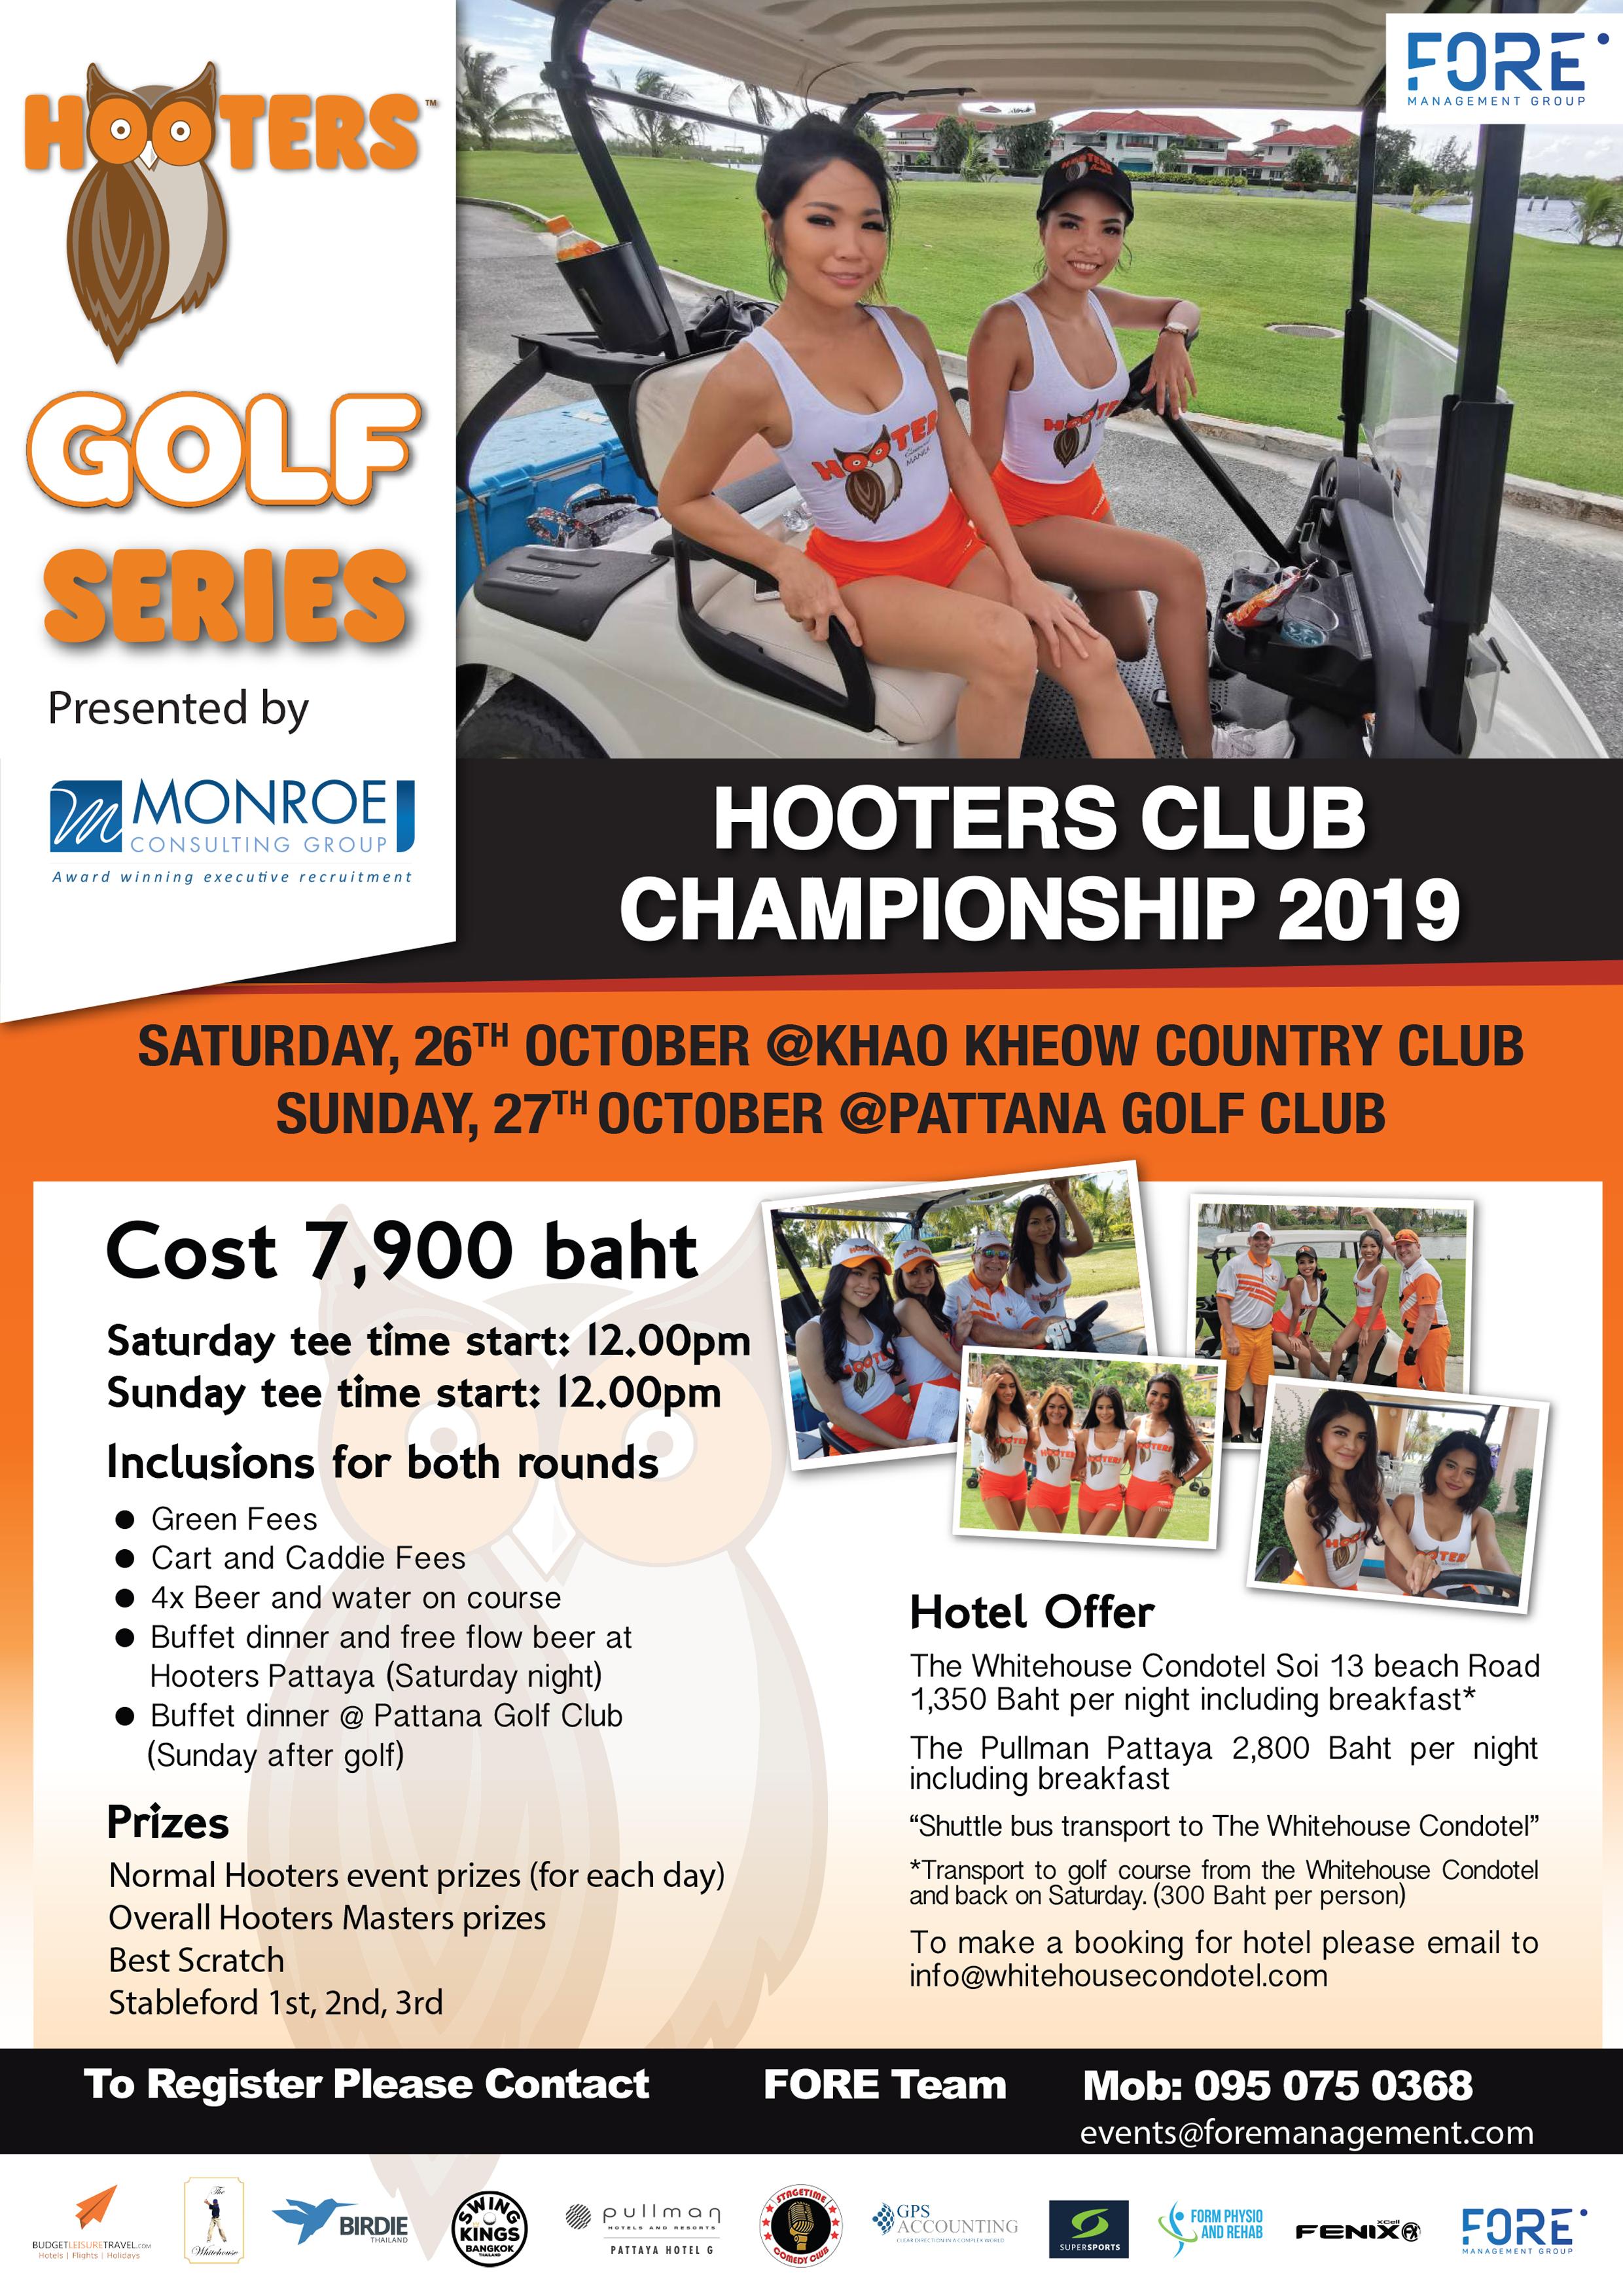 Hooters Club Championship.jpg